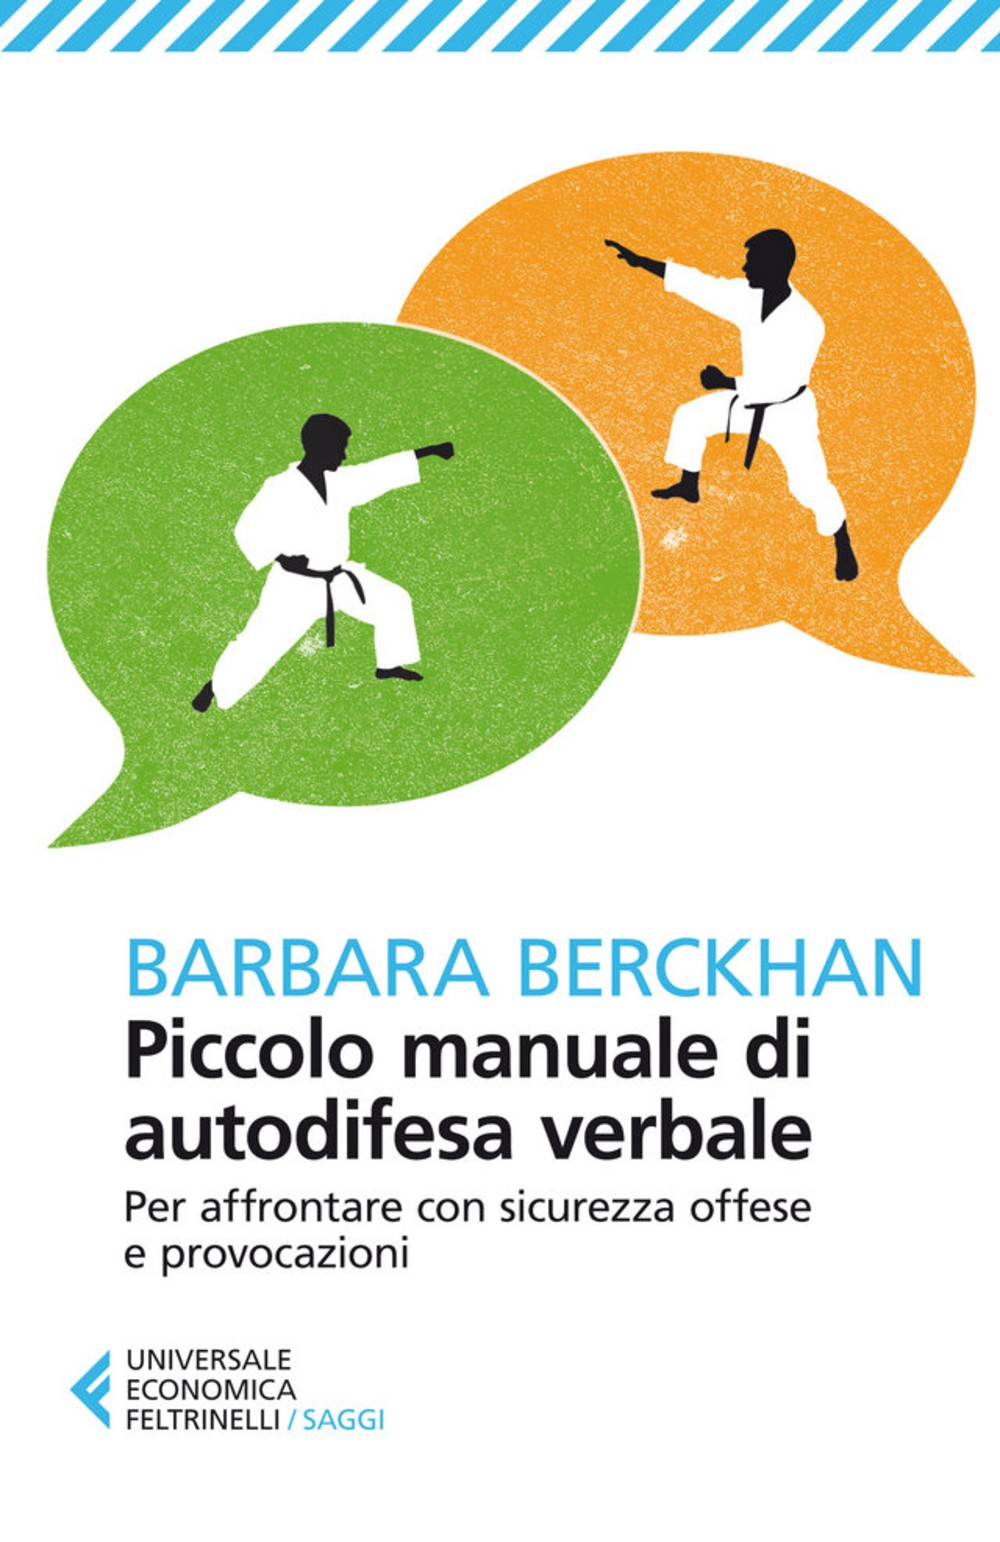 PIccolo manuale di autodifesa verbale – Barbara Berckan – Feltrinelli